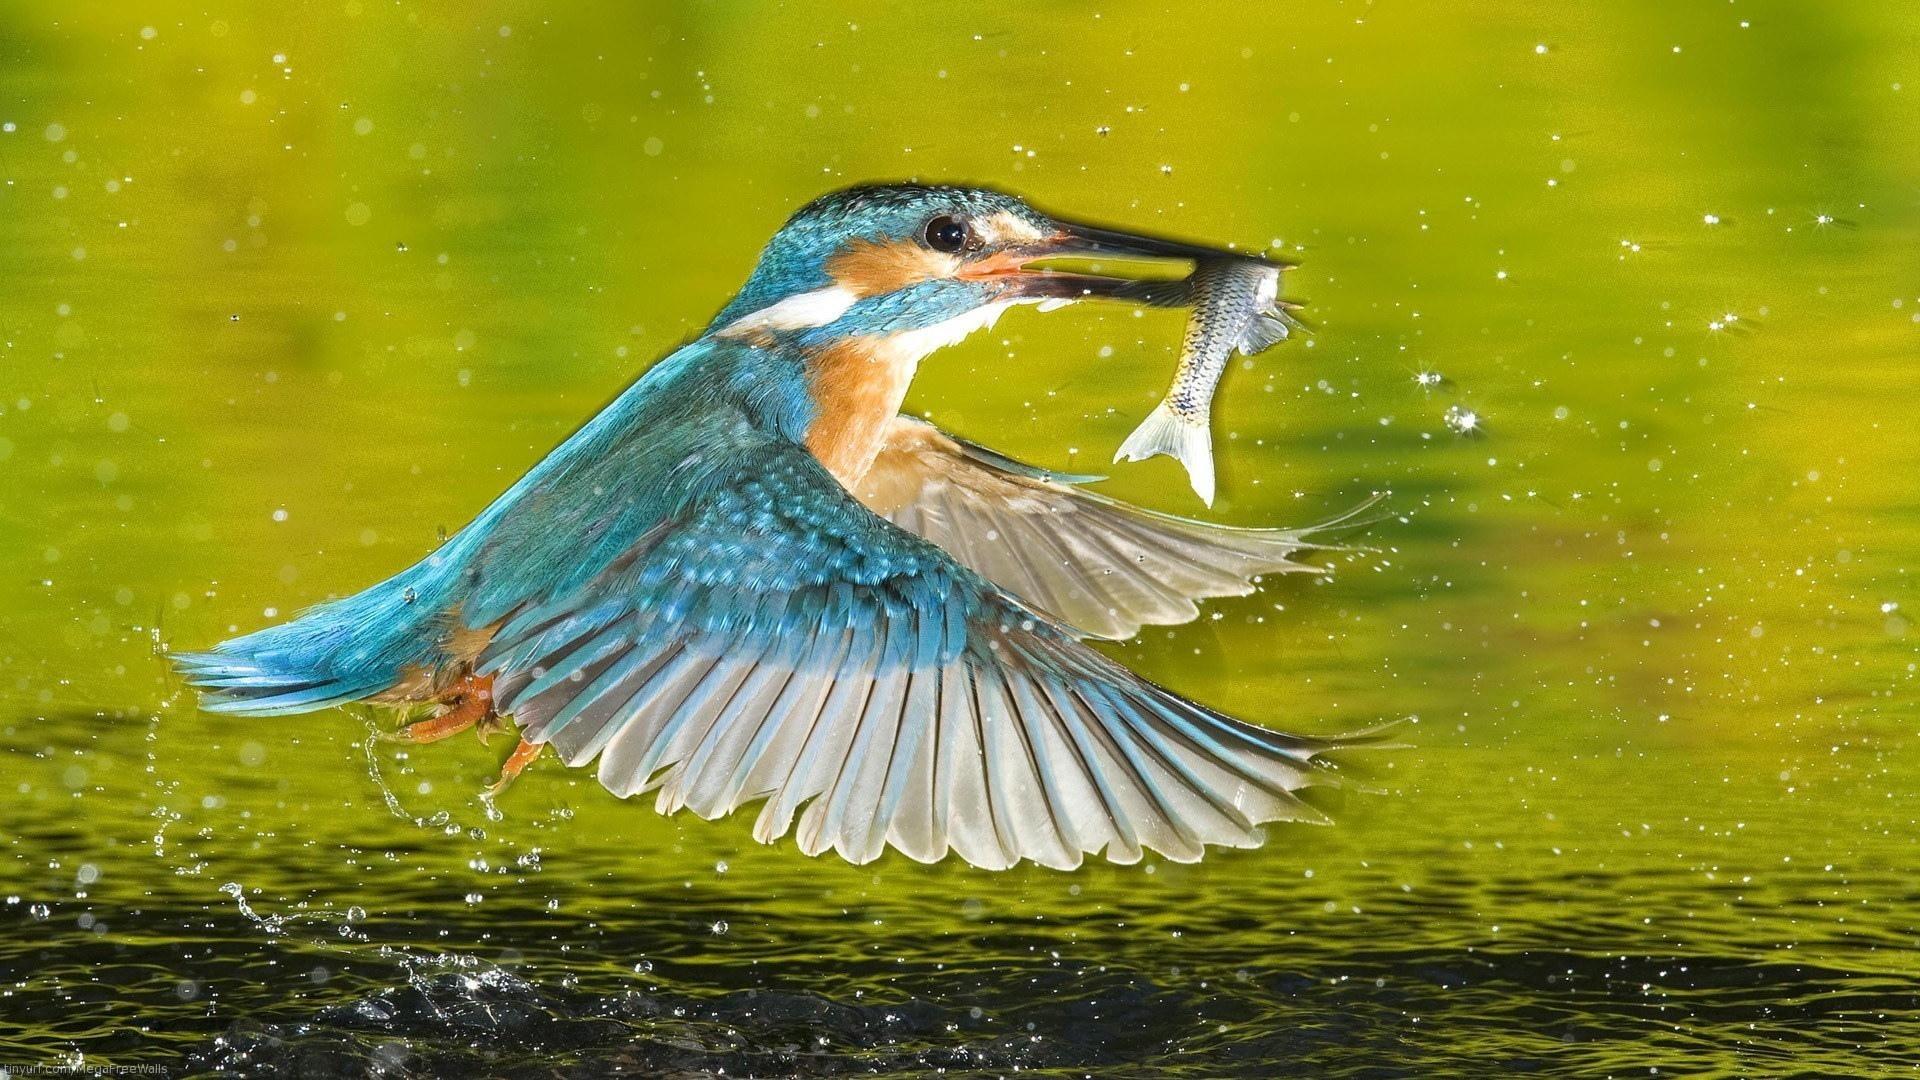 Kingfisher wallpaper photo hd